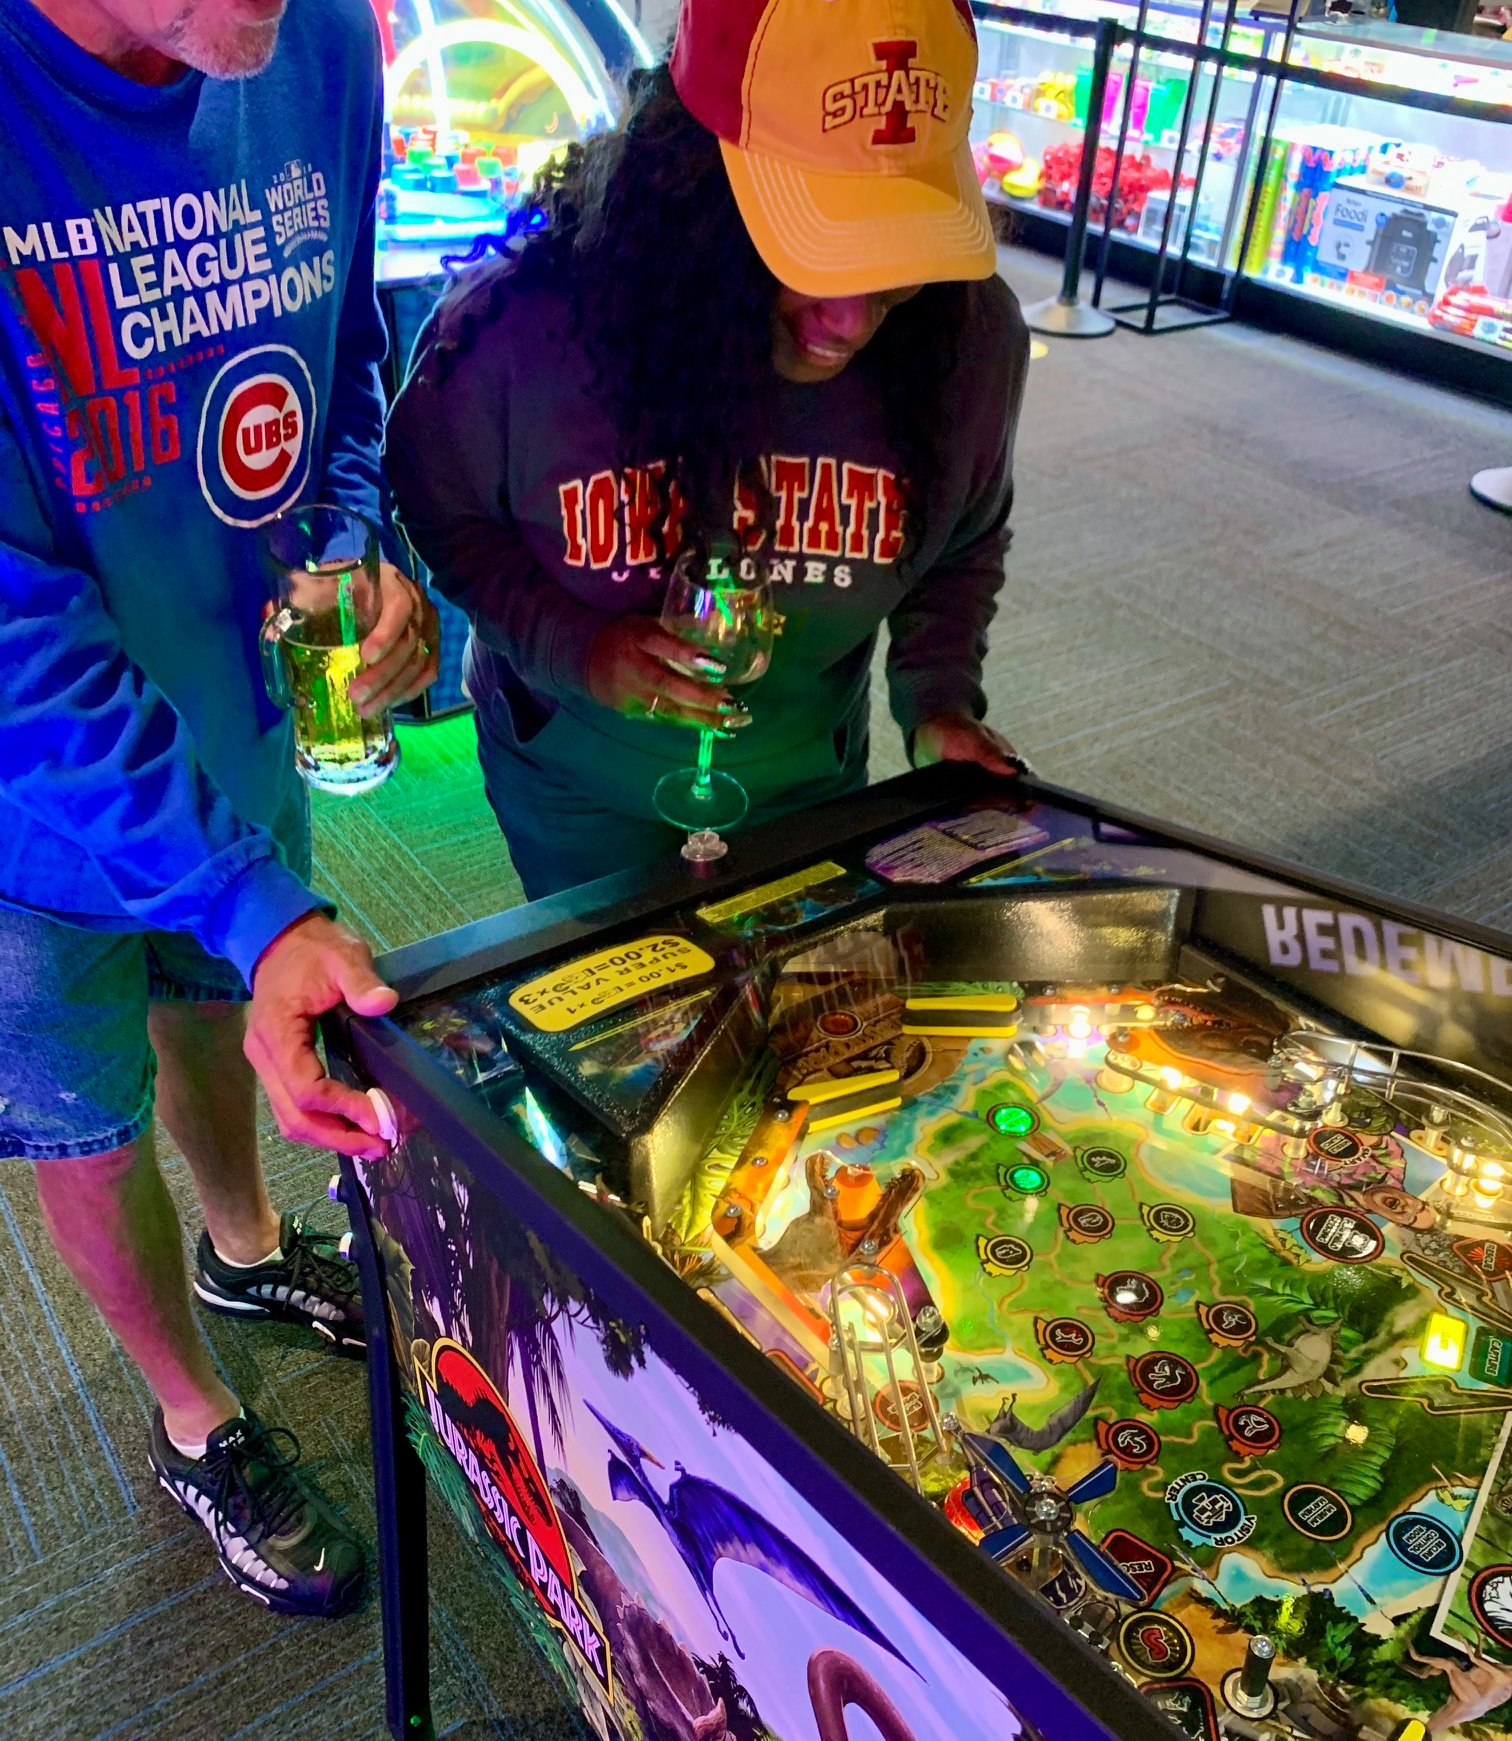 GameDay pinball